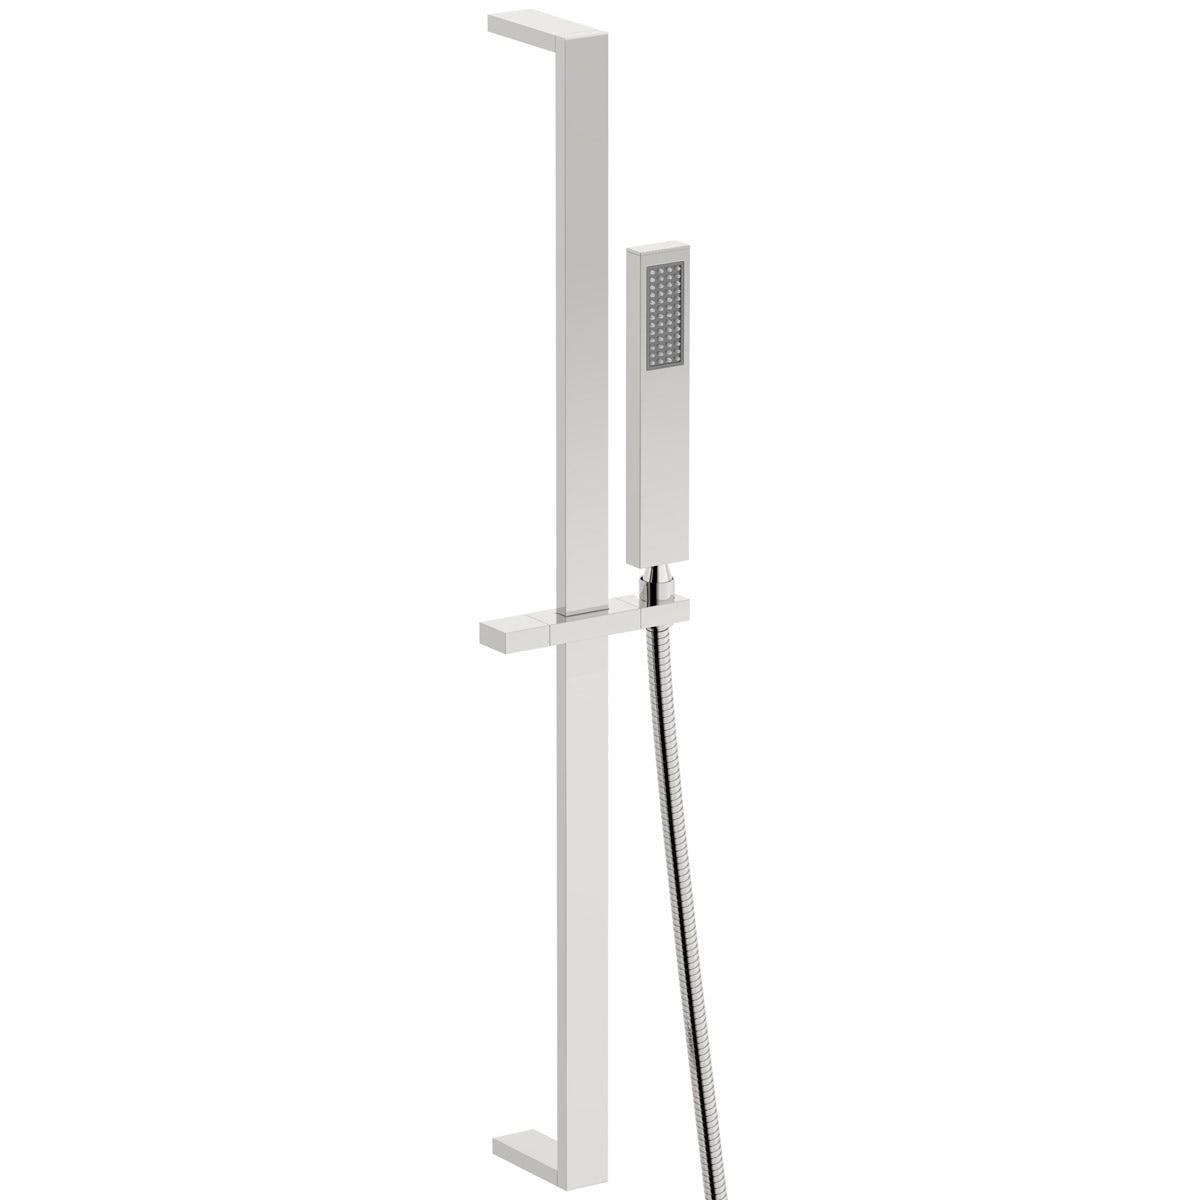 Mode Tetra sliding shower rail kit